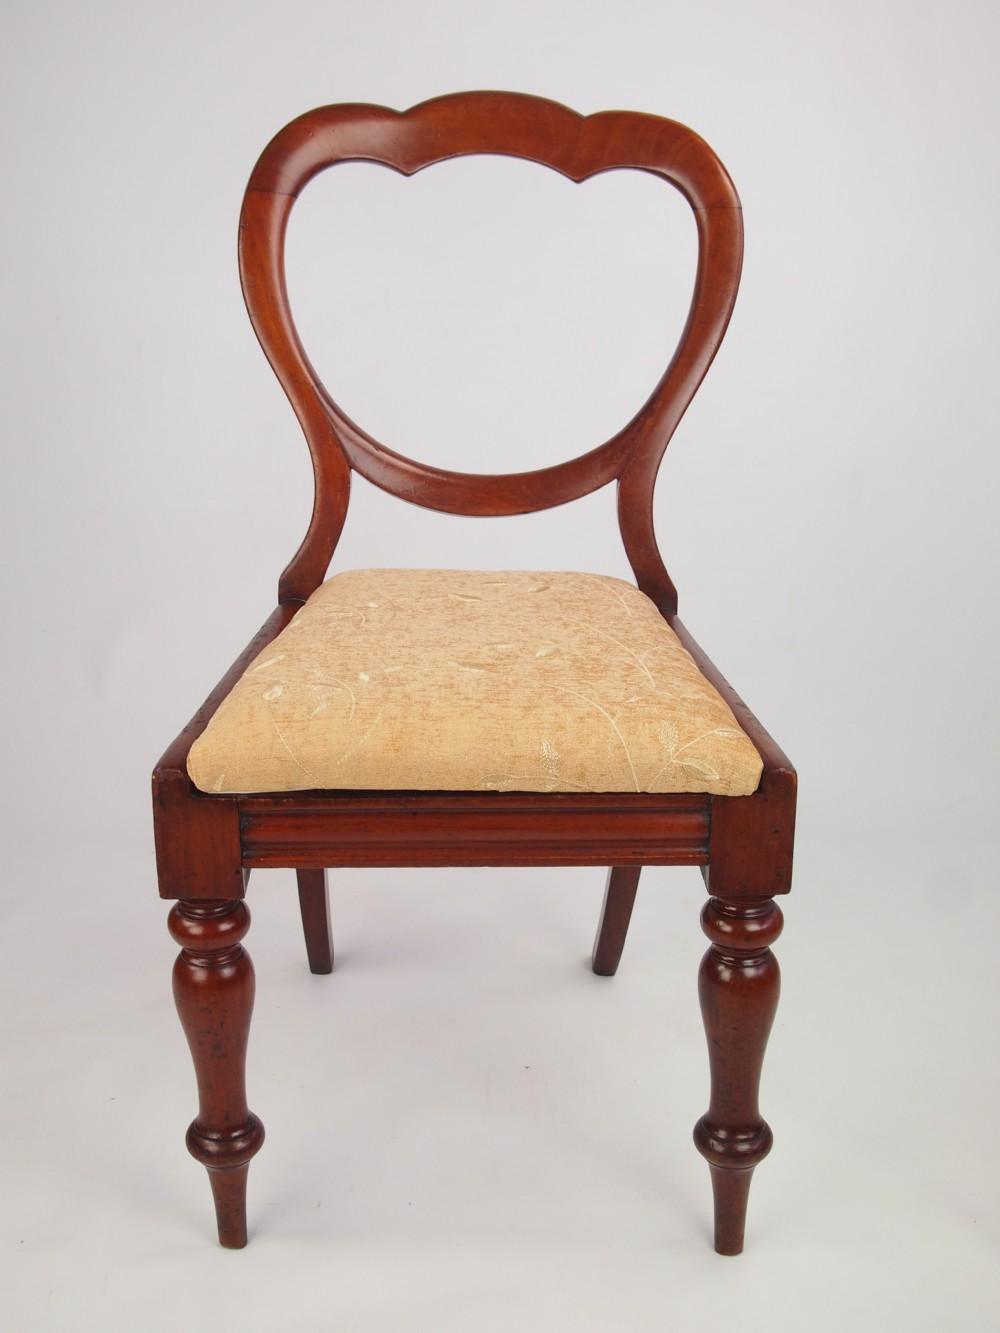 Antique Victorian Mahogany Balloon Back Chair 265991